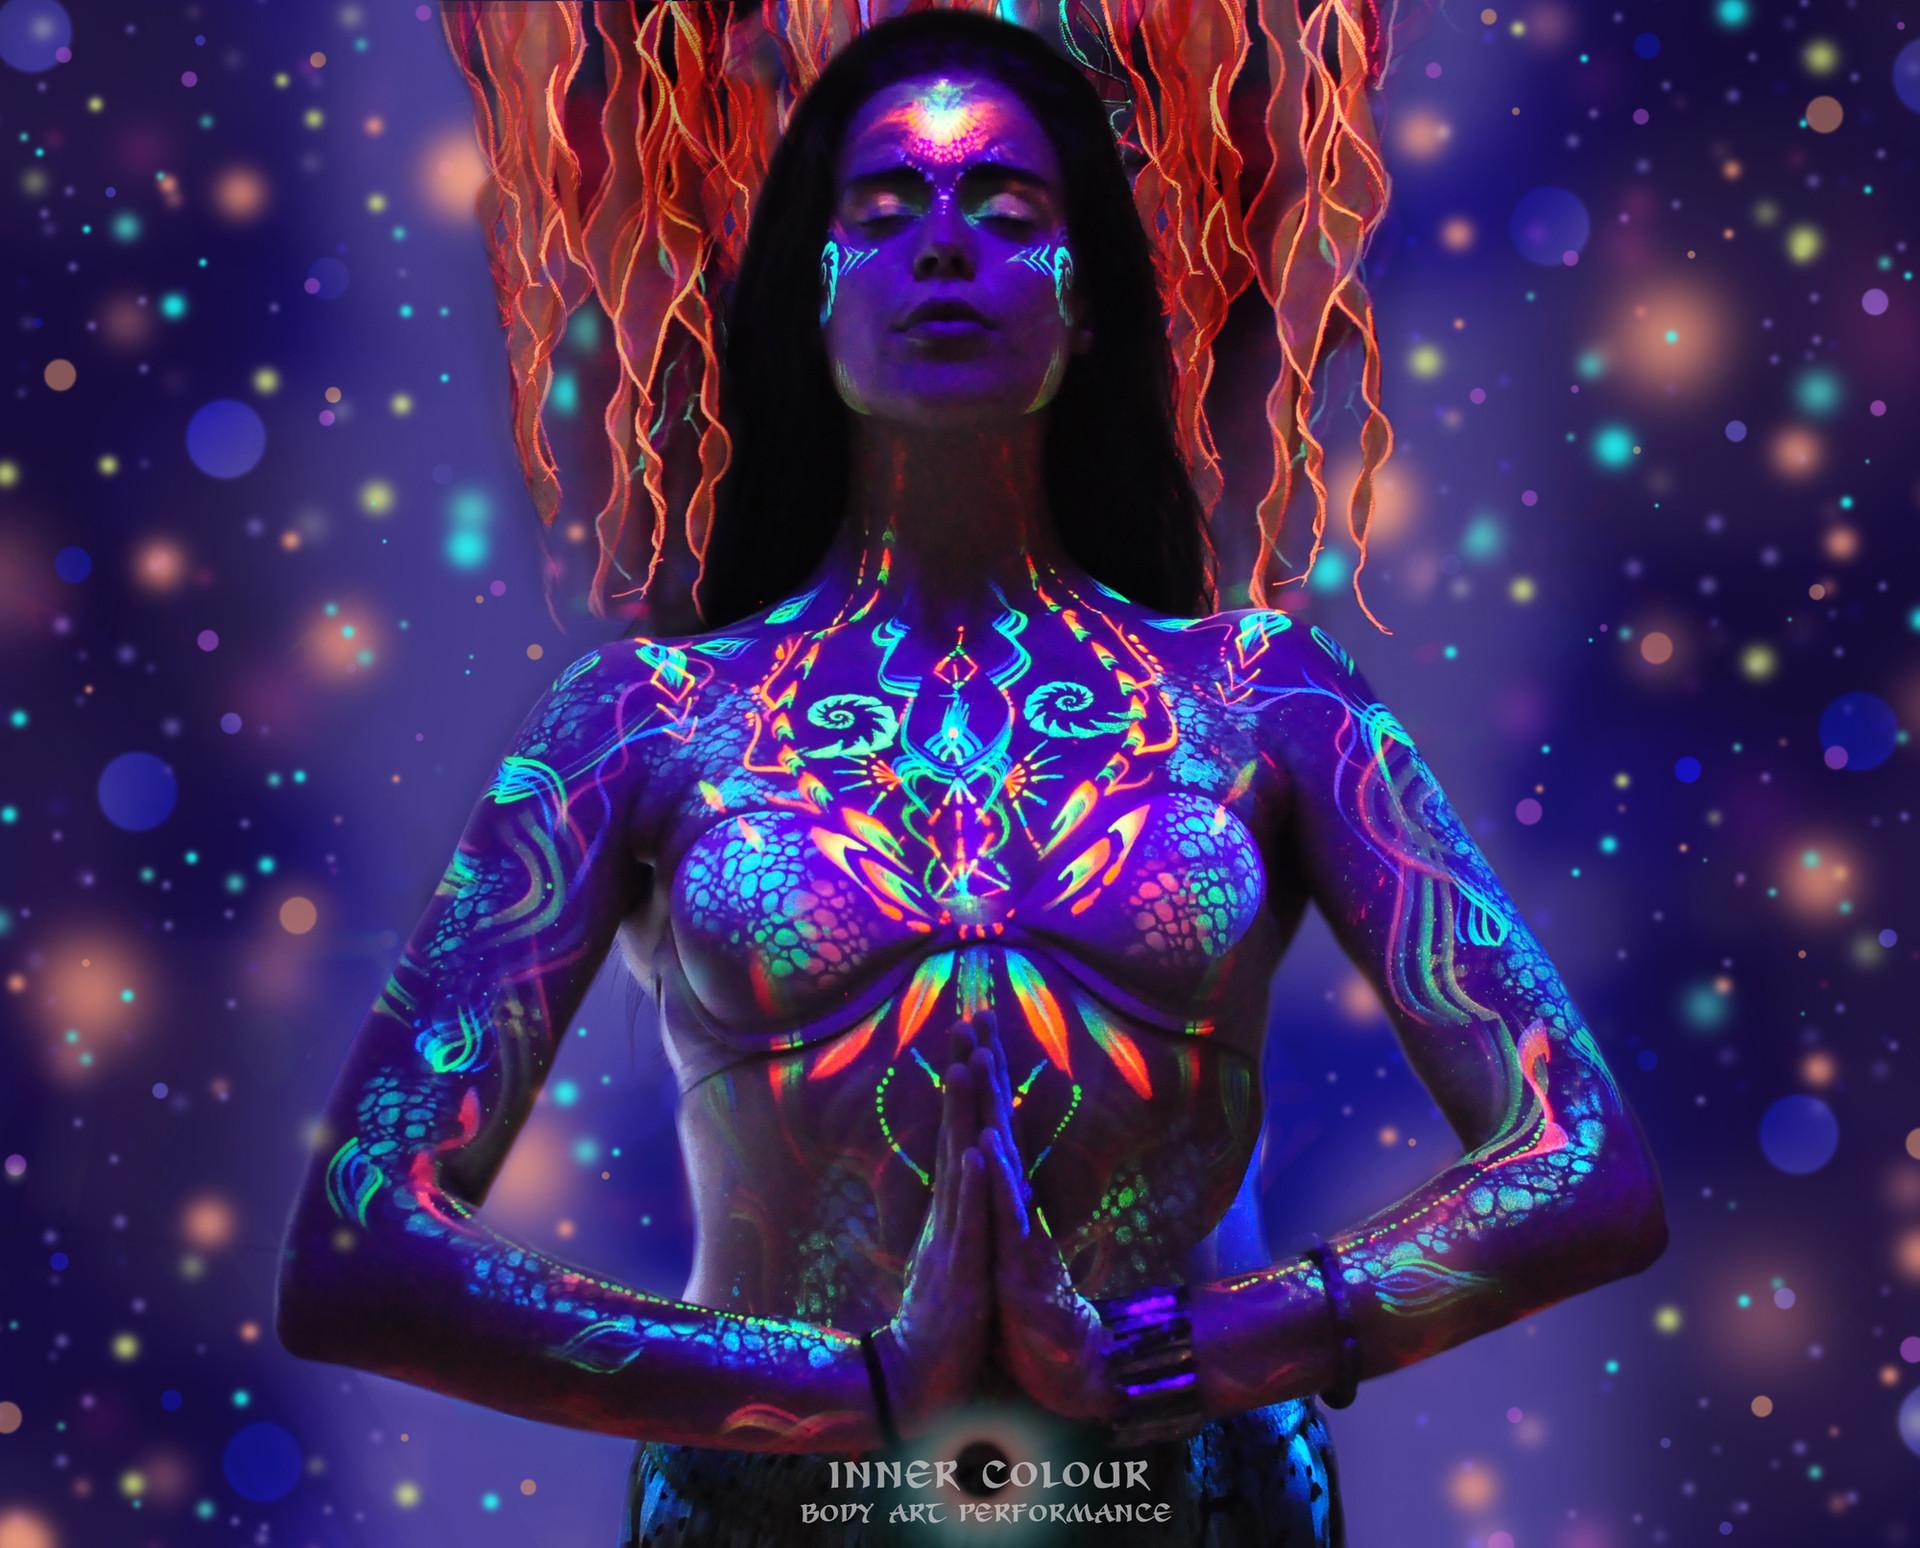 Live Body Art Performance Deya Dova Shaa Inner Colour